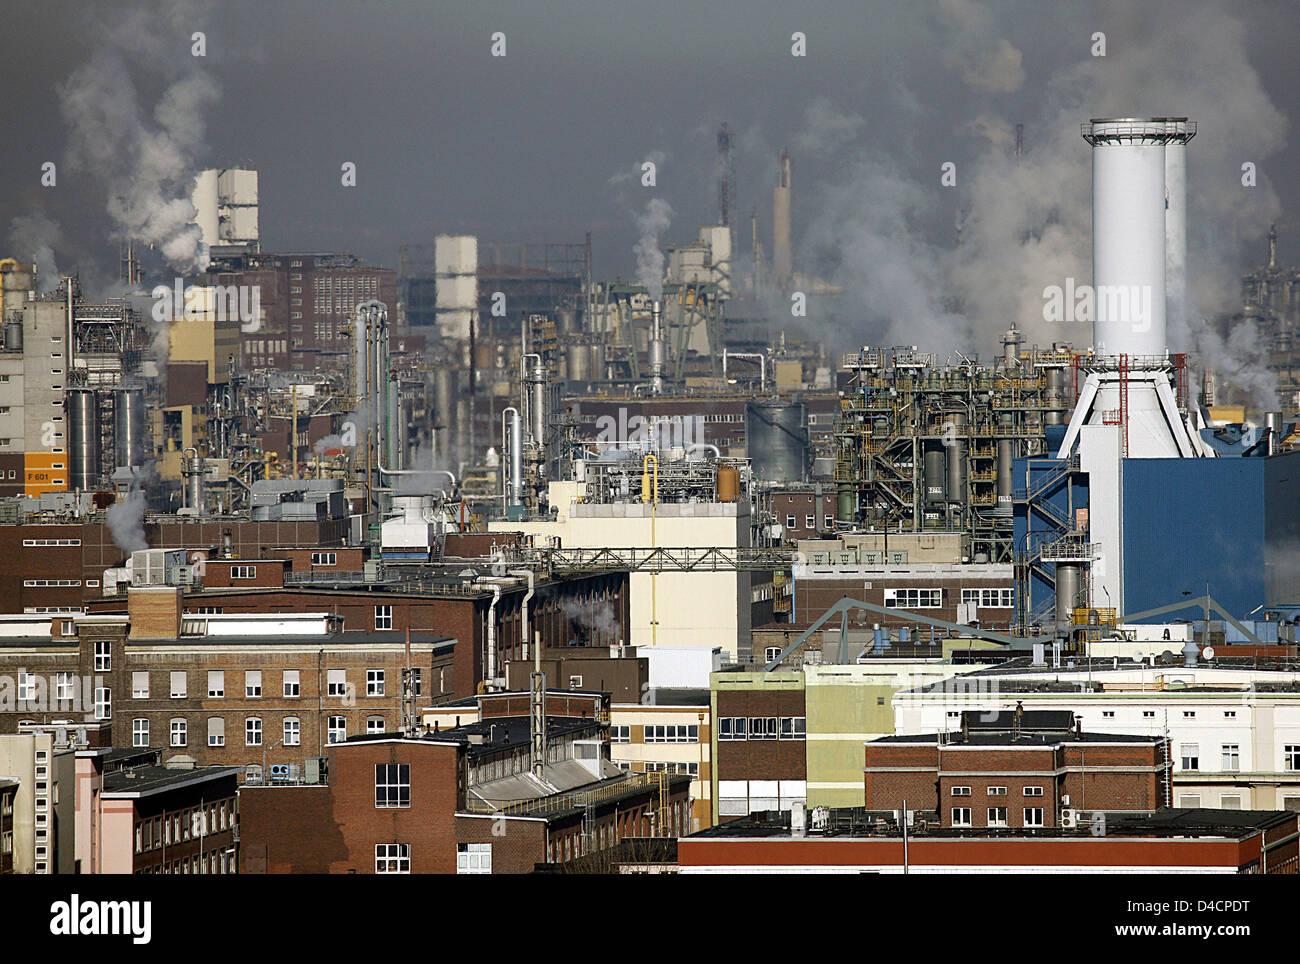 Ludwigshafen Plant Basf Stock Photos & Ludwigshafen Plant ...